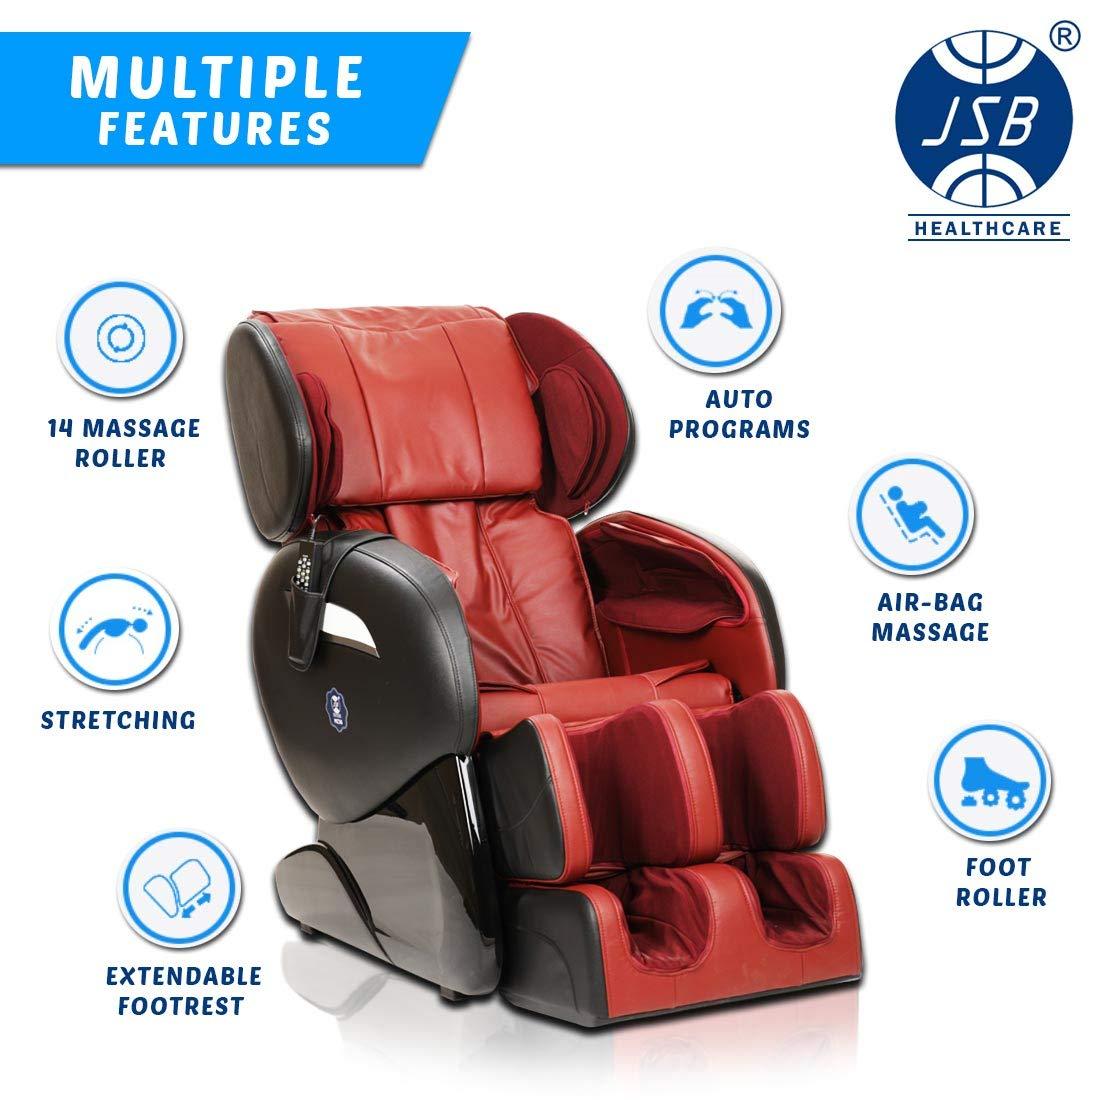 JSB MZ30 Massage Chair